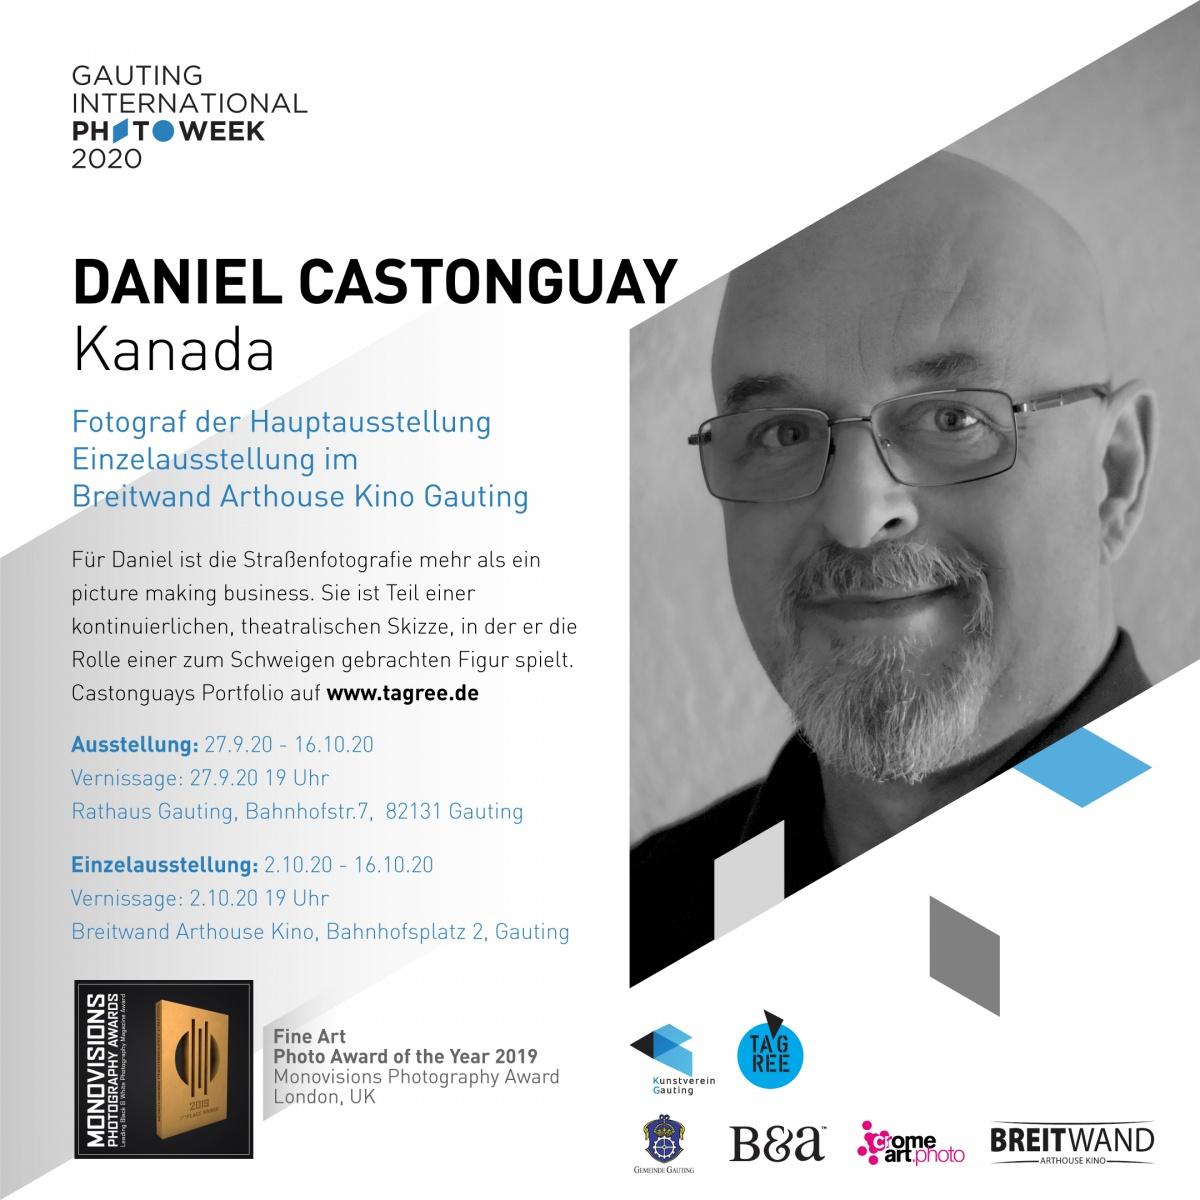 Daniel Castonguay / Kanada